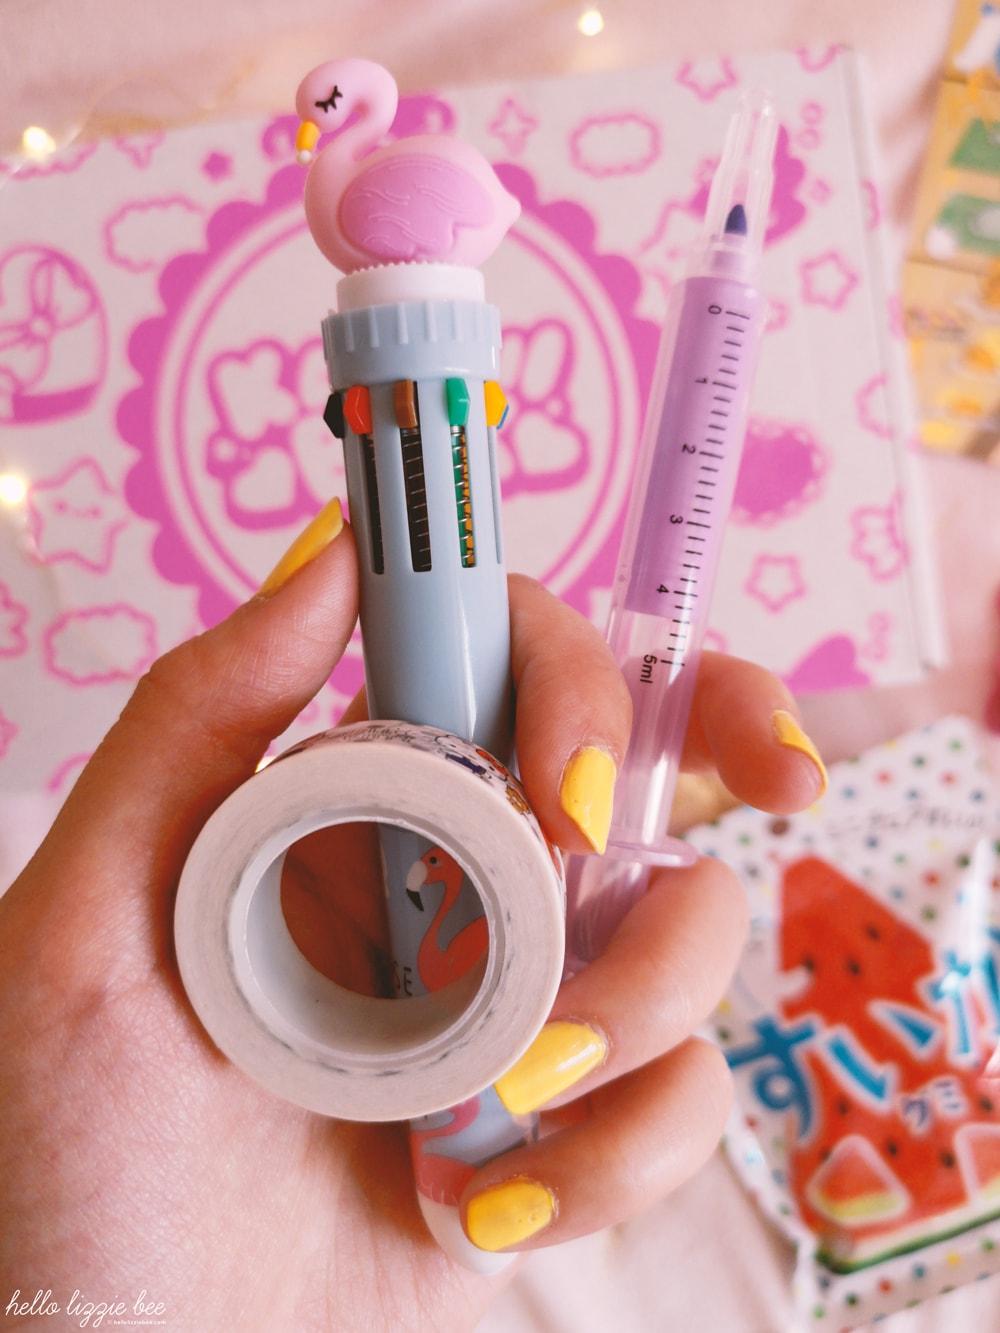 flamingo multicolur pen, hello kitty washi tape, syringe highlighter pen